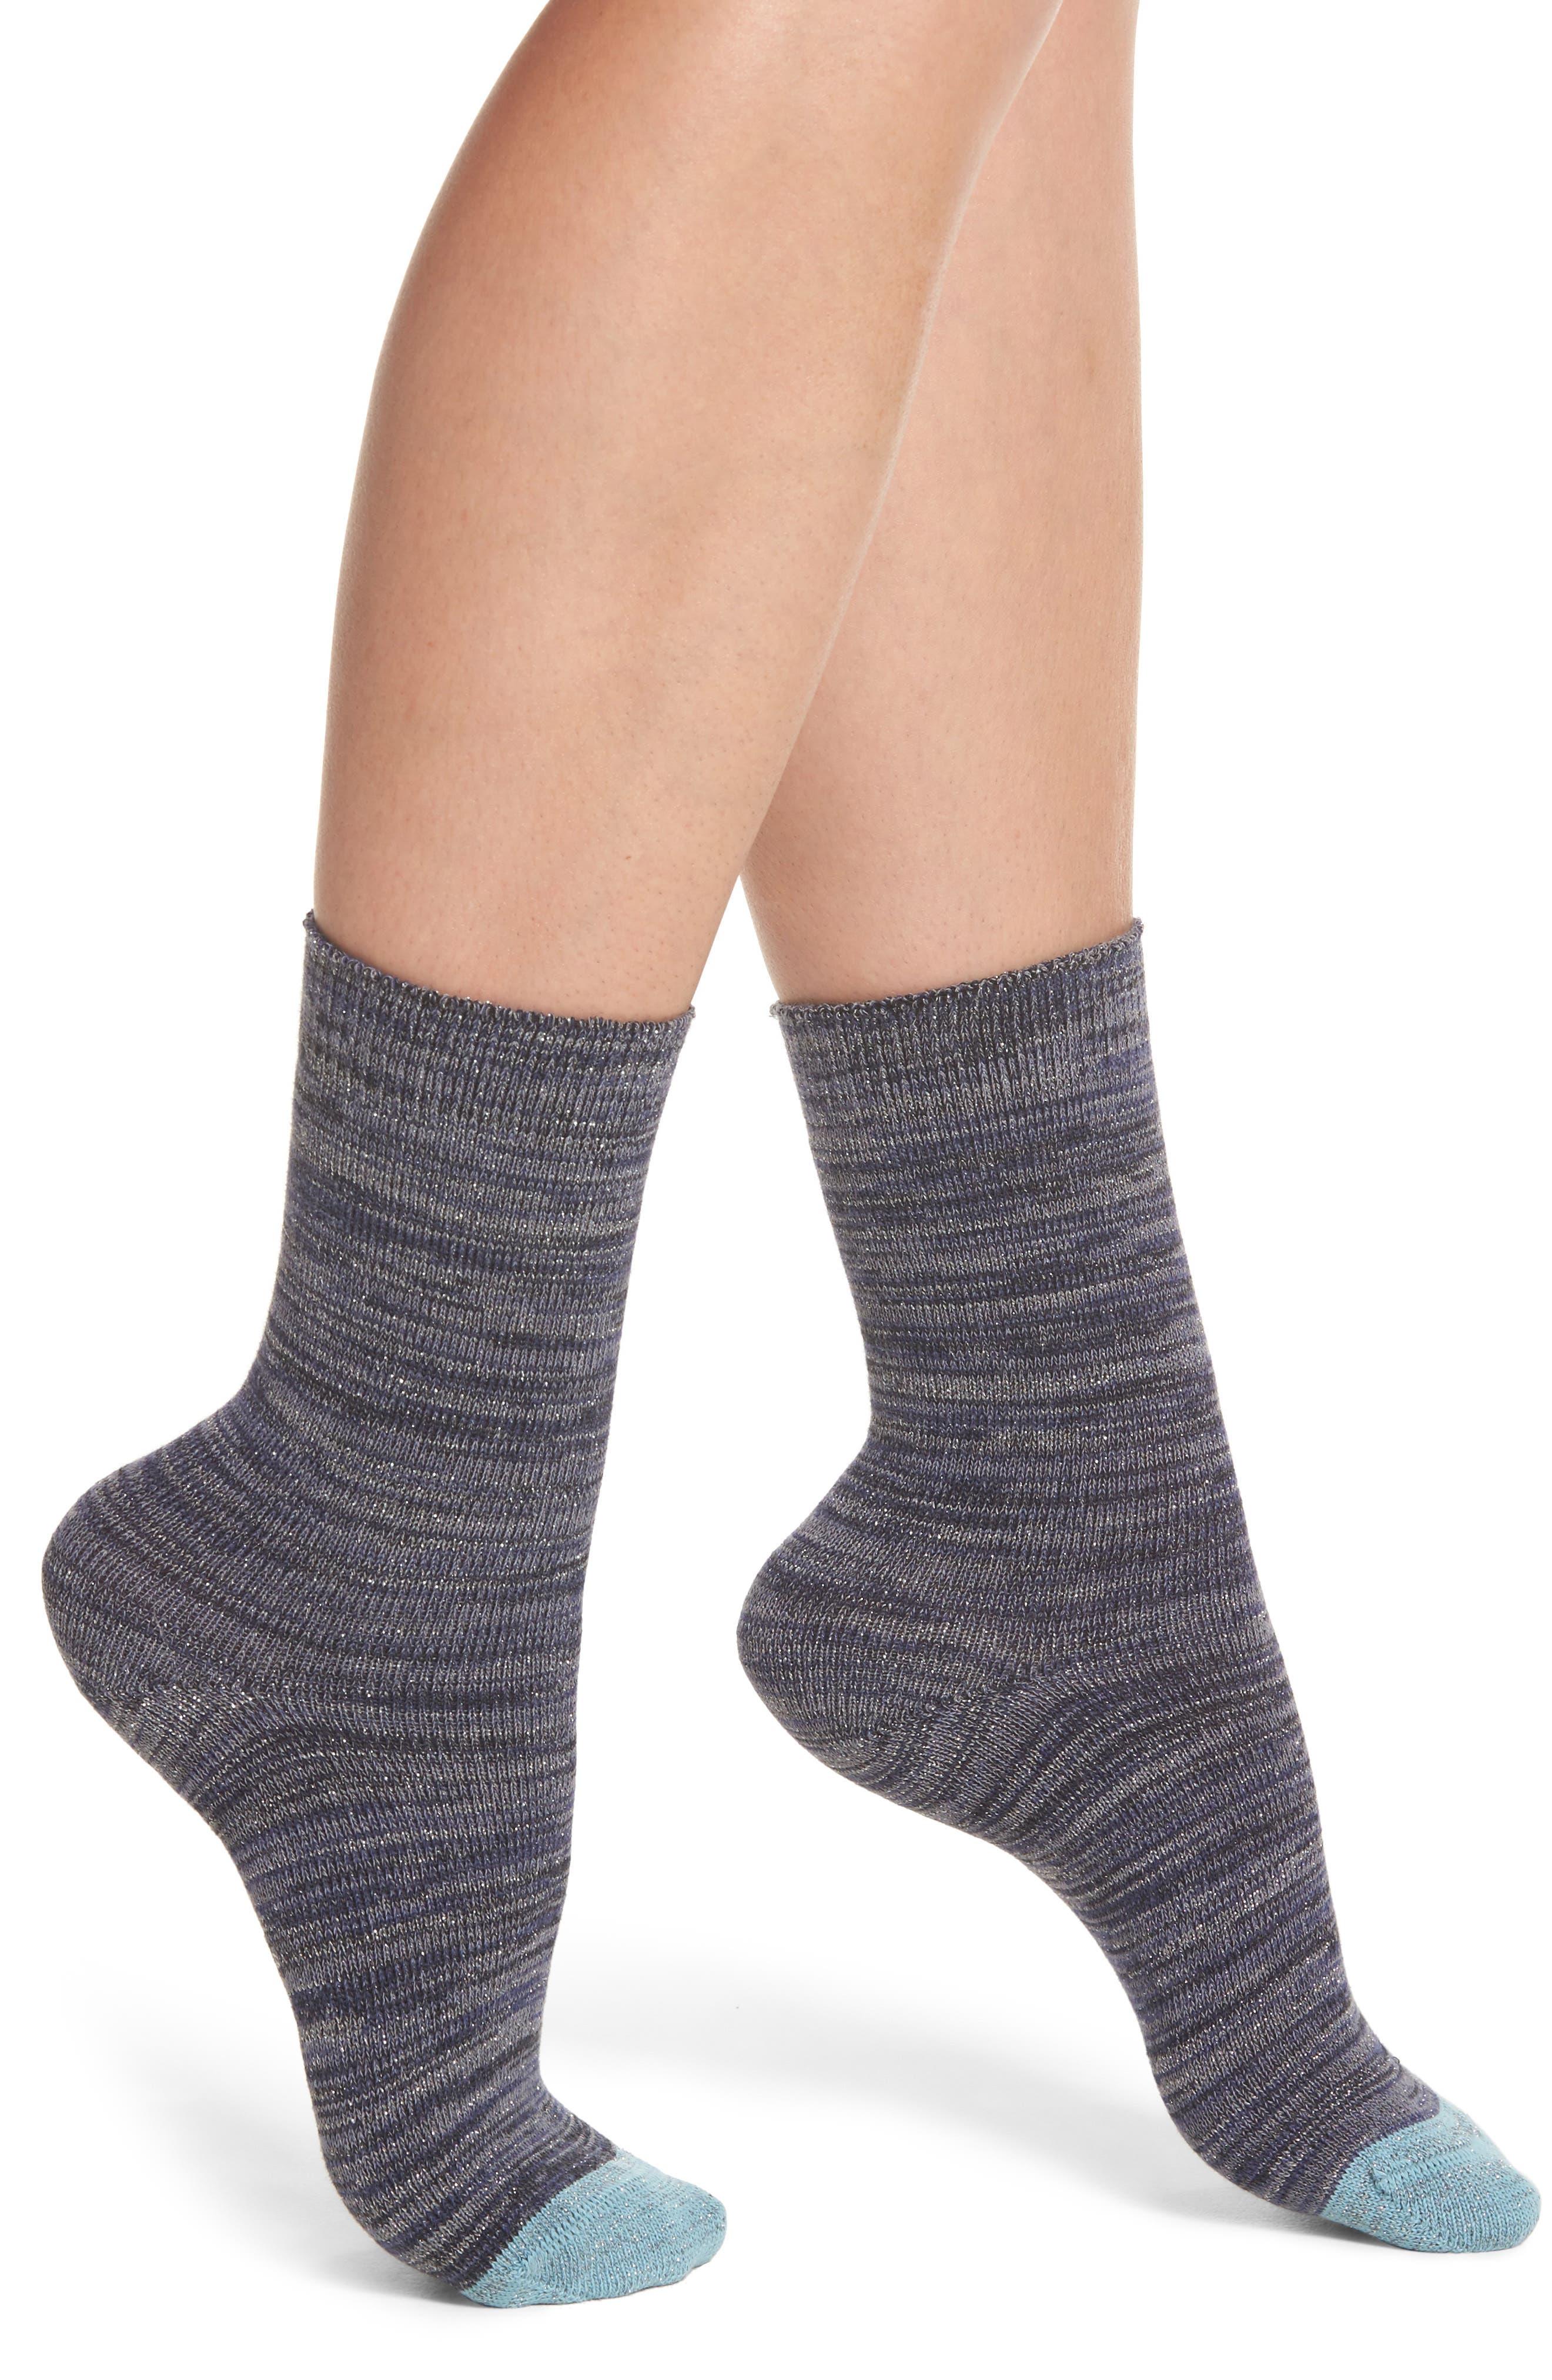 Emily Twinkletoes Crew Socks,                             Main thumbnail 1, color,                             400